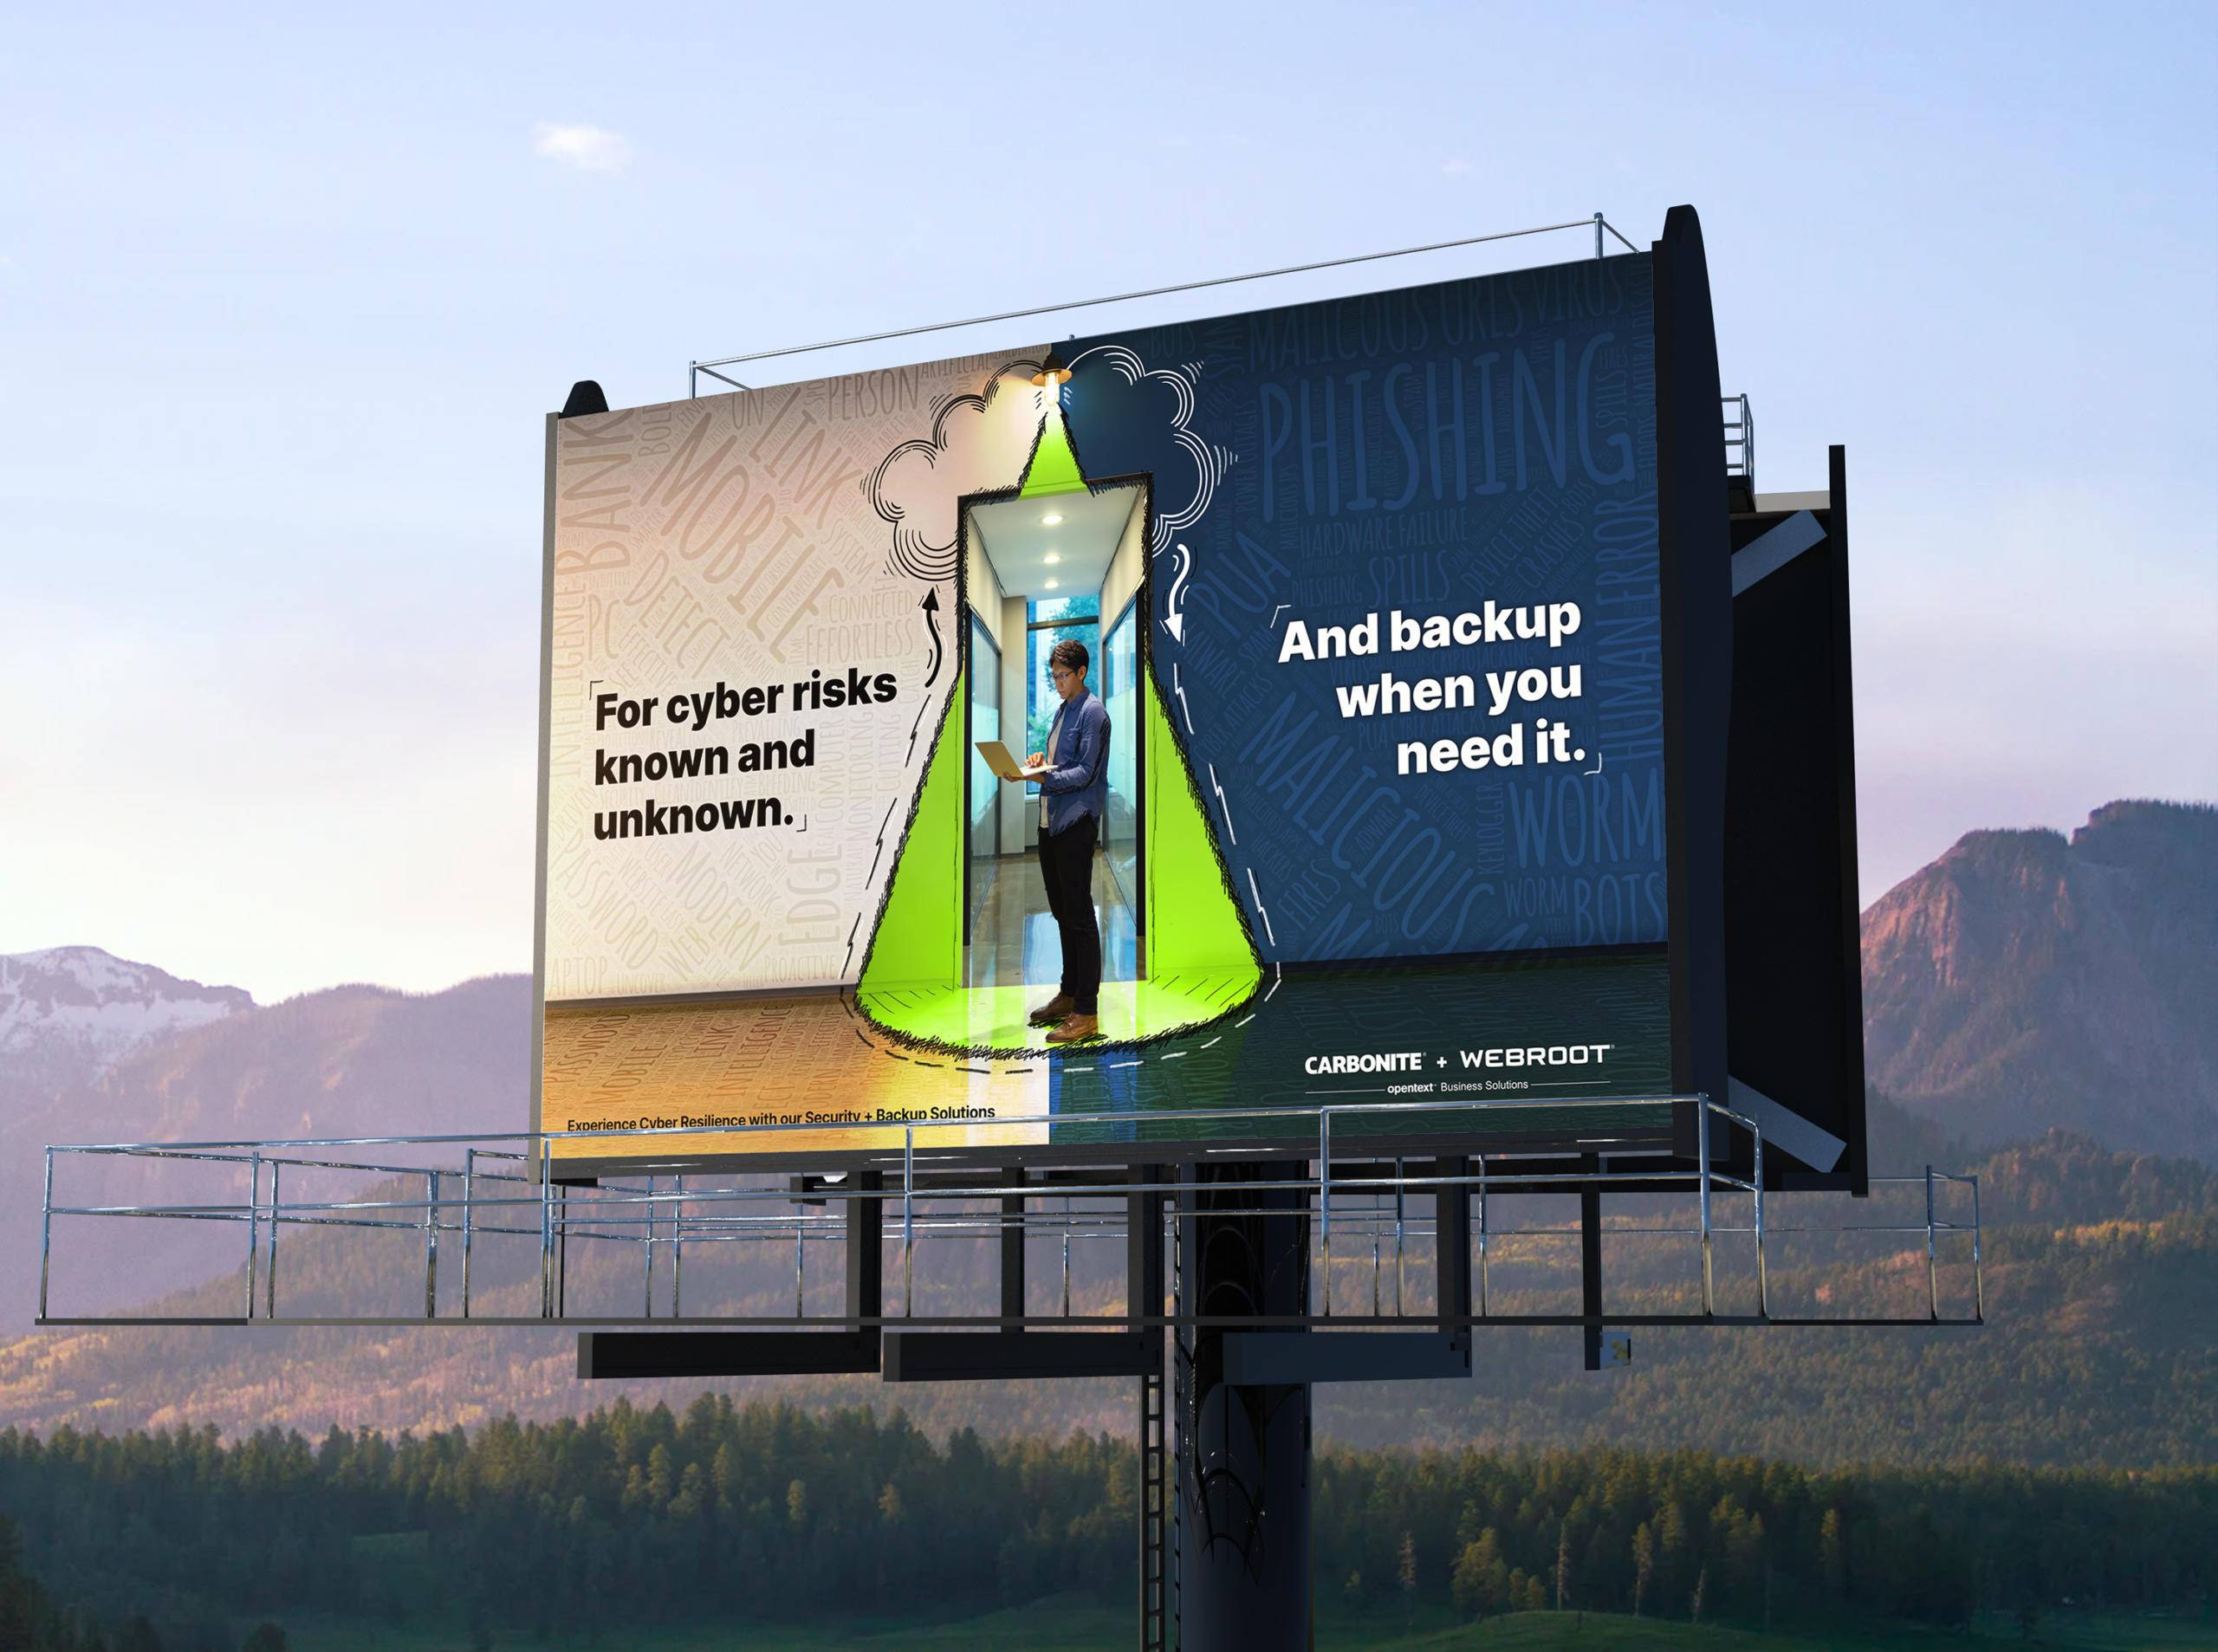 Cloudburst_Carbonite-Webroot_Campaign-SMB_Billboard-scaled